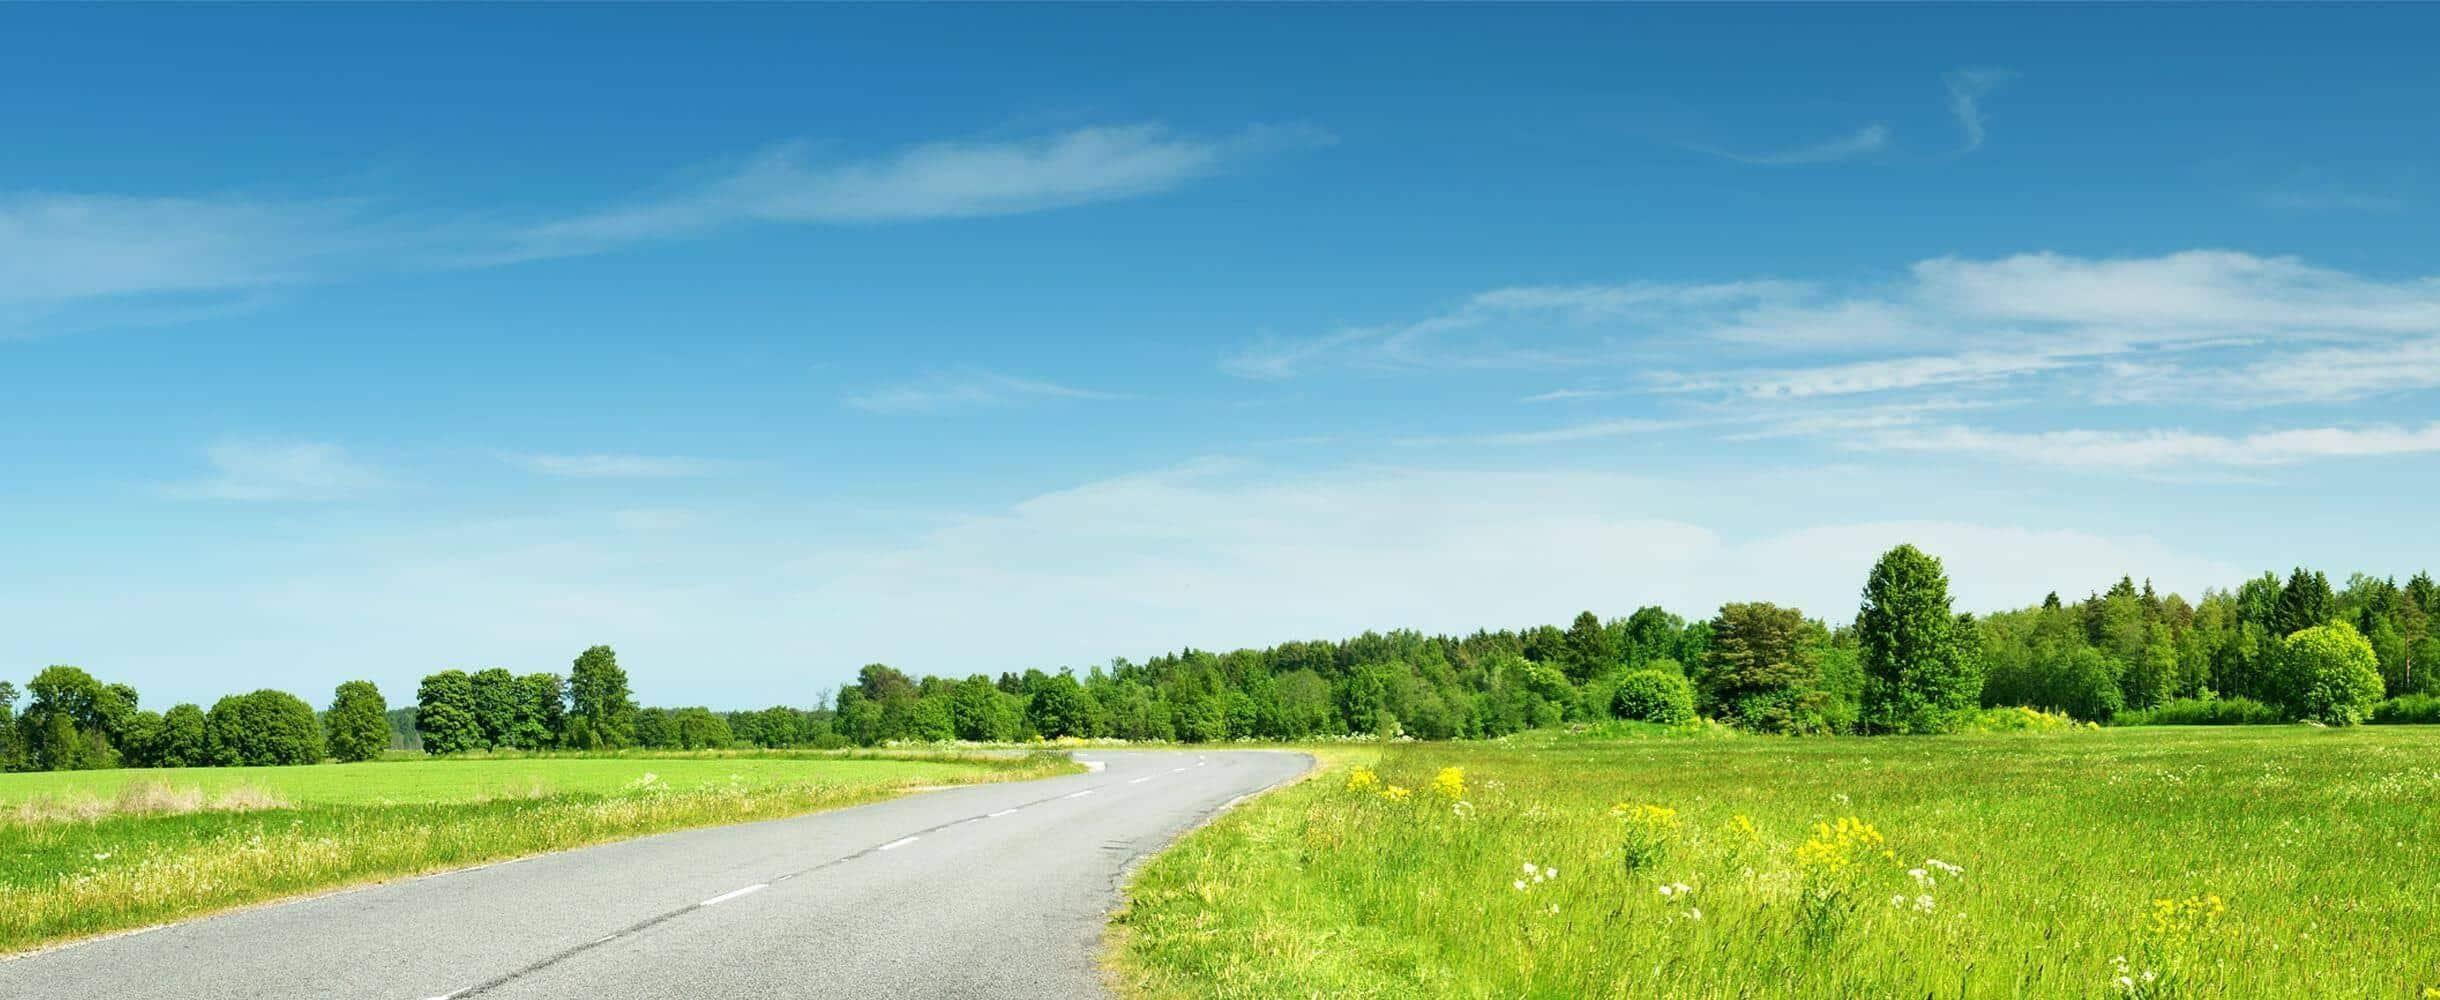 Espace Construction Yffiniac Avis car rentals from avis, book online now & save | avis car